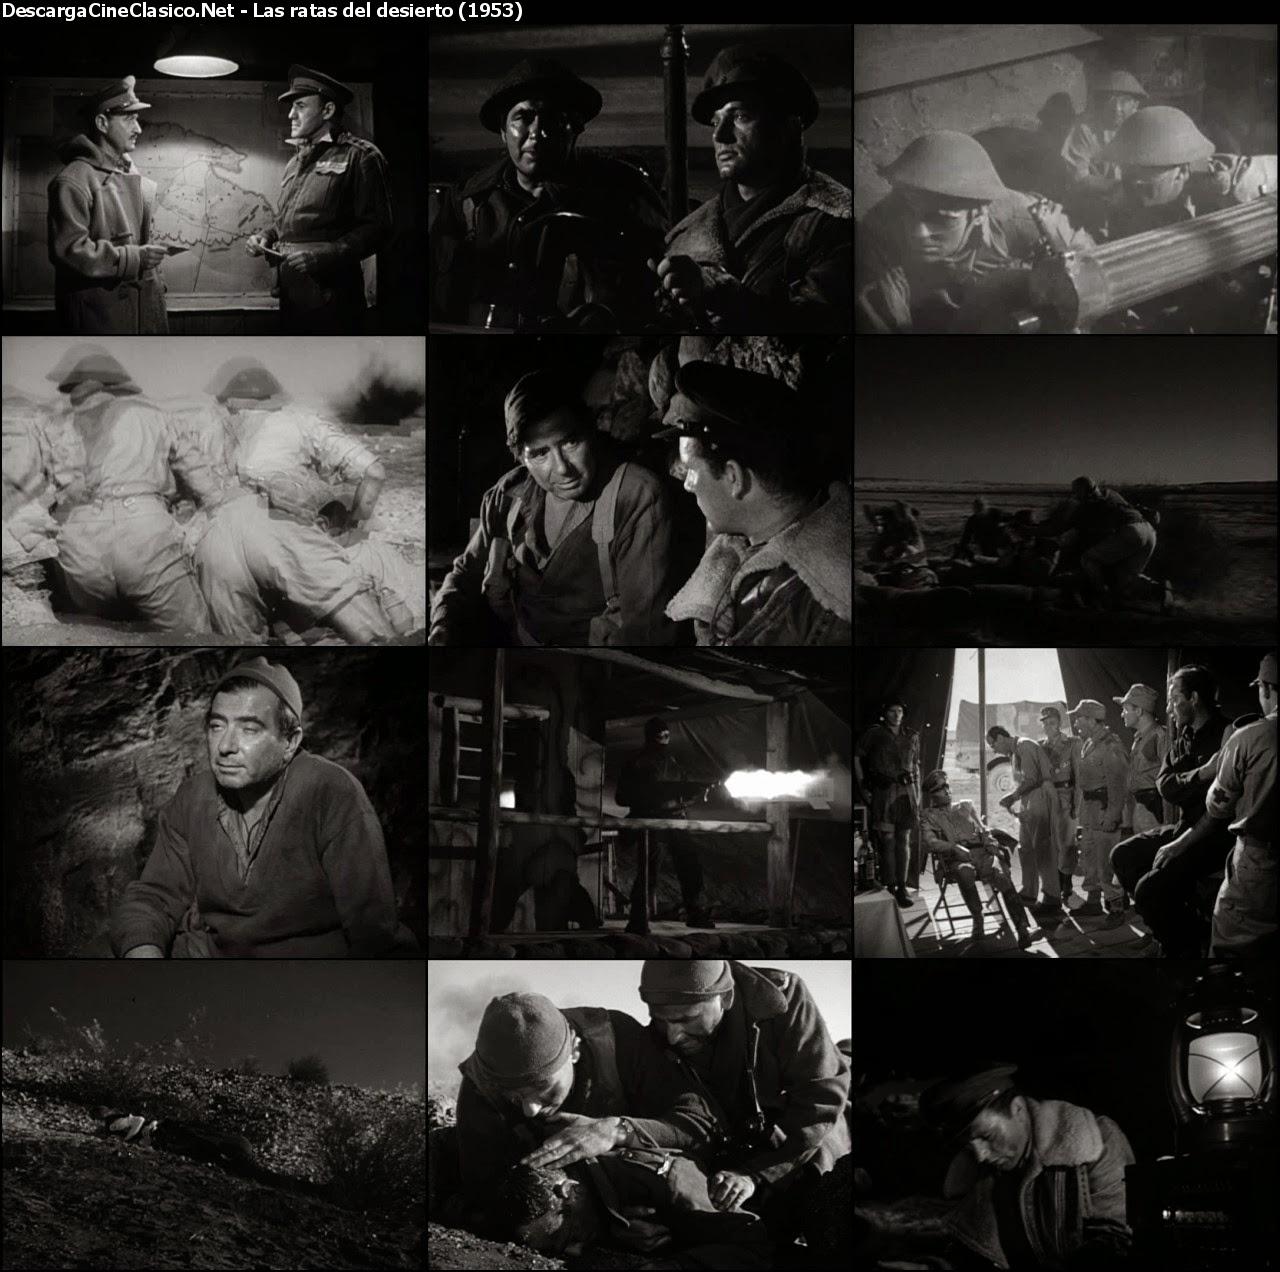 Las ratas del desierto (1953) (The Desert Rats)